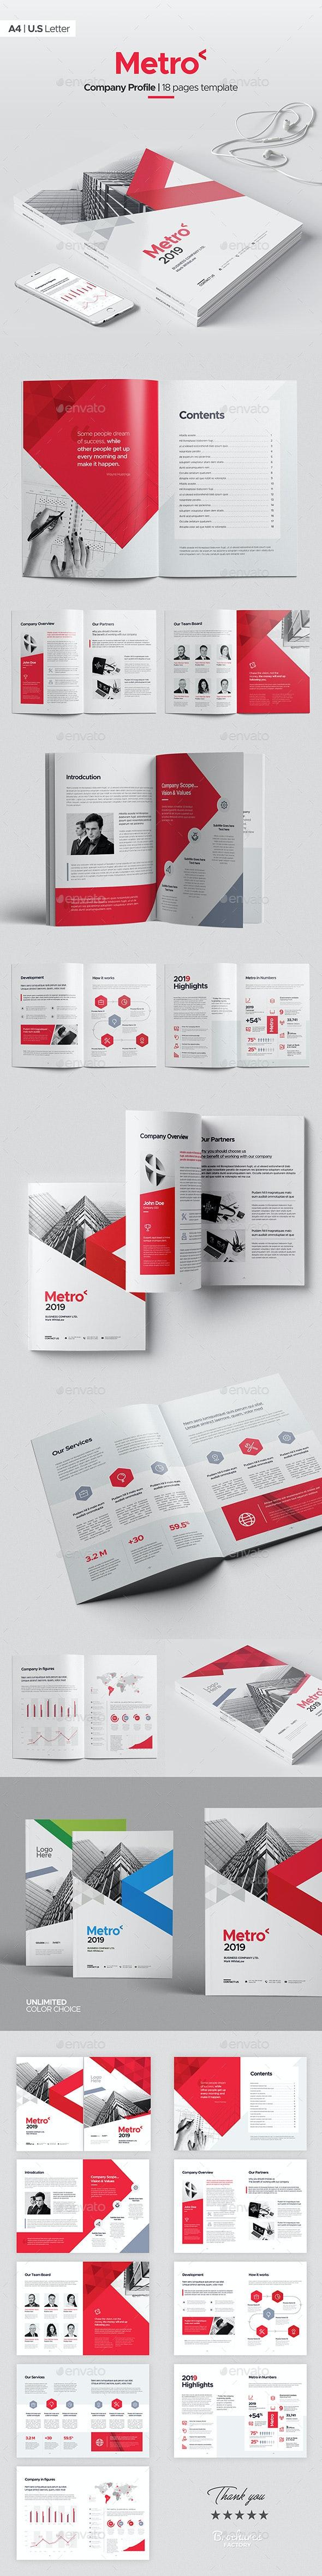 Metro Company Profile 2019 - Corporate Brochures